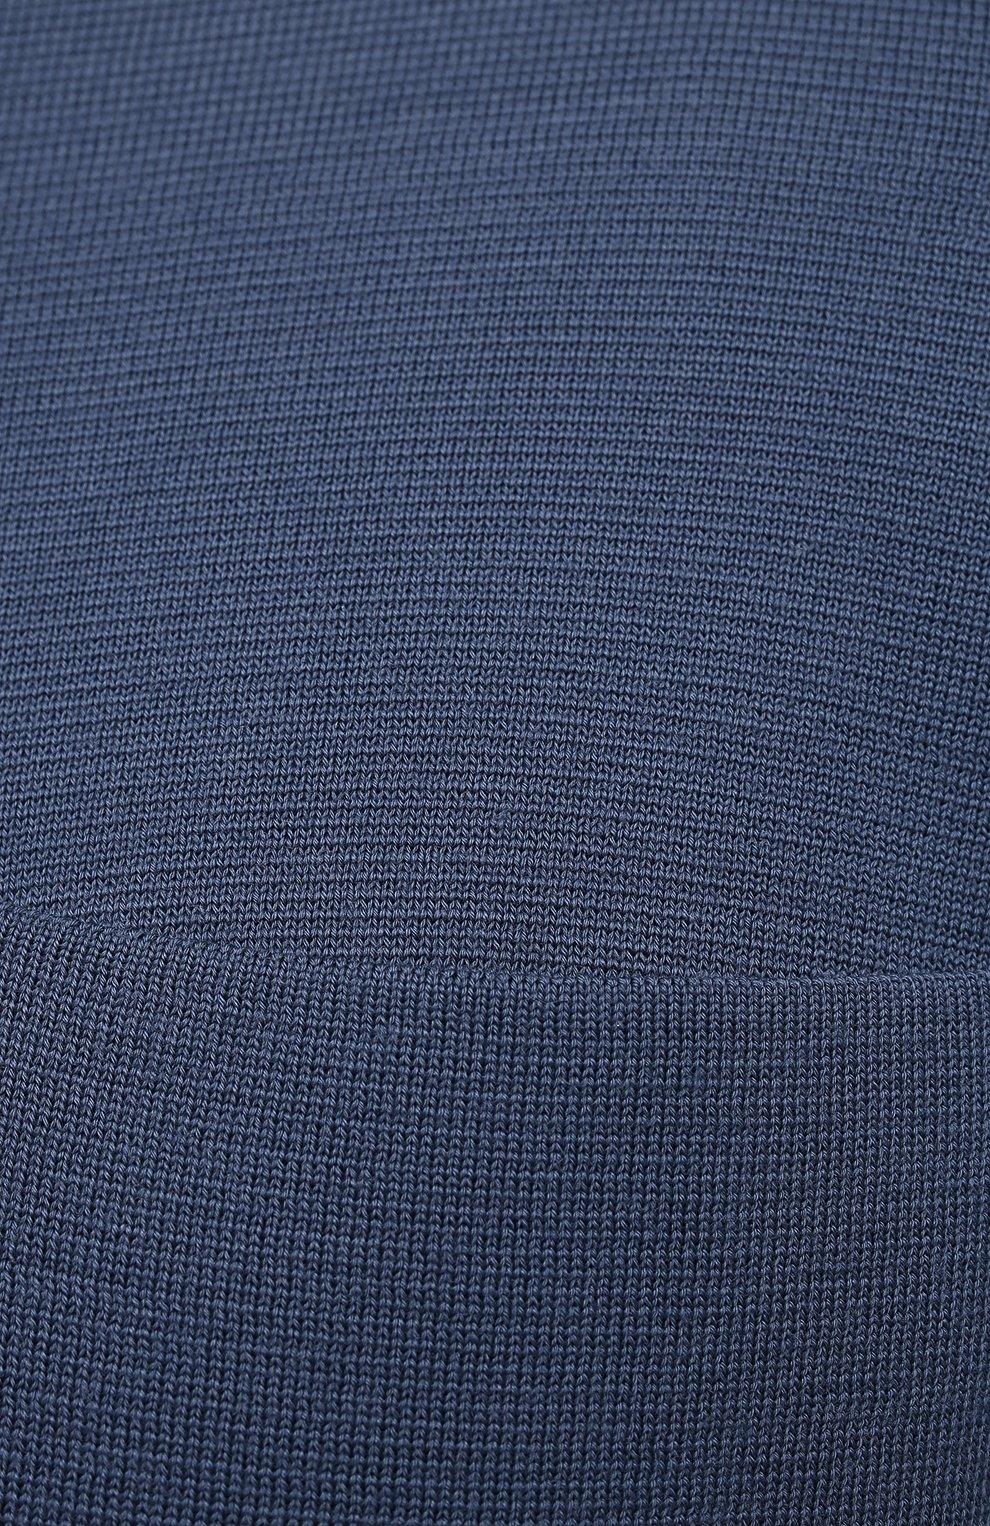 Мужской кардиган из кашемира и шерсти BRIONI синего цвета, арт. UMHH0L/09K08   Фото 5